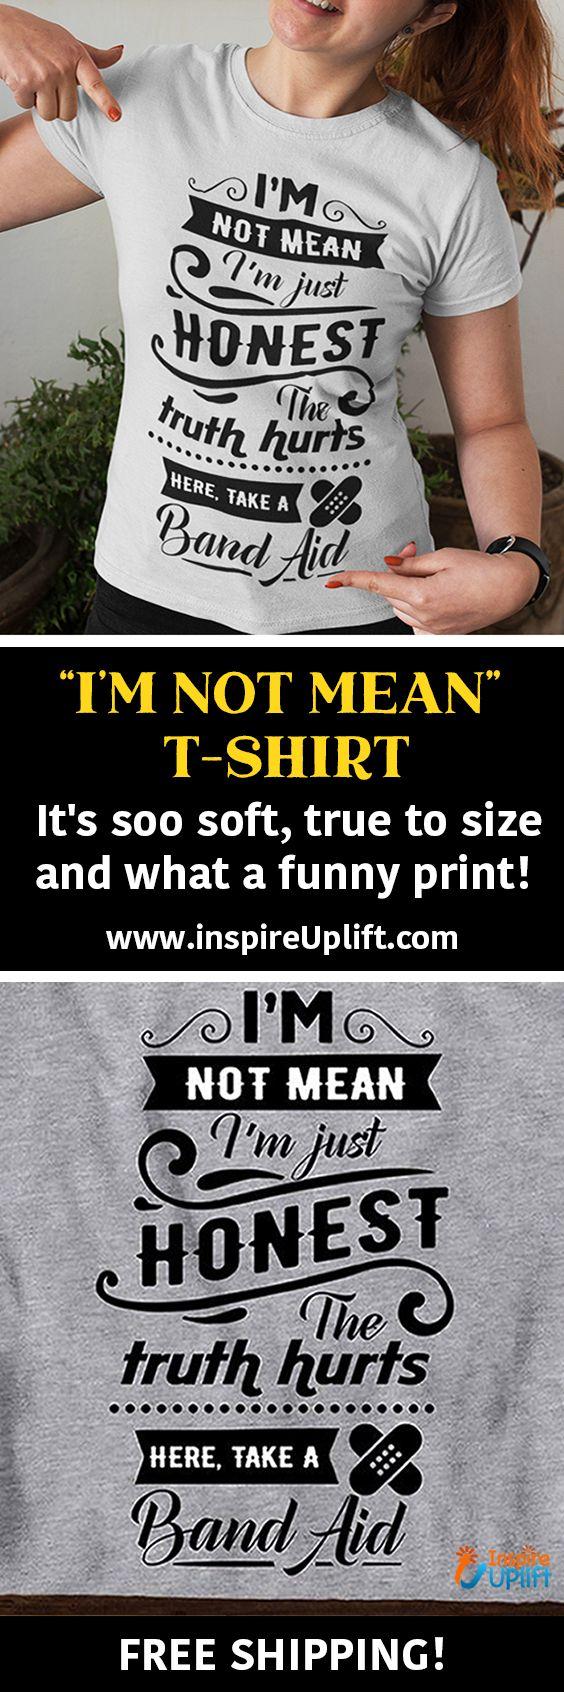 """Love This T-Shirt!"" 😍 InspireUplift.com"